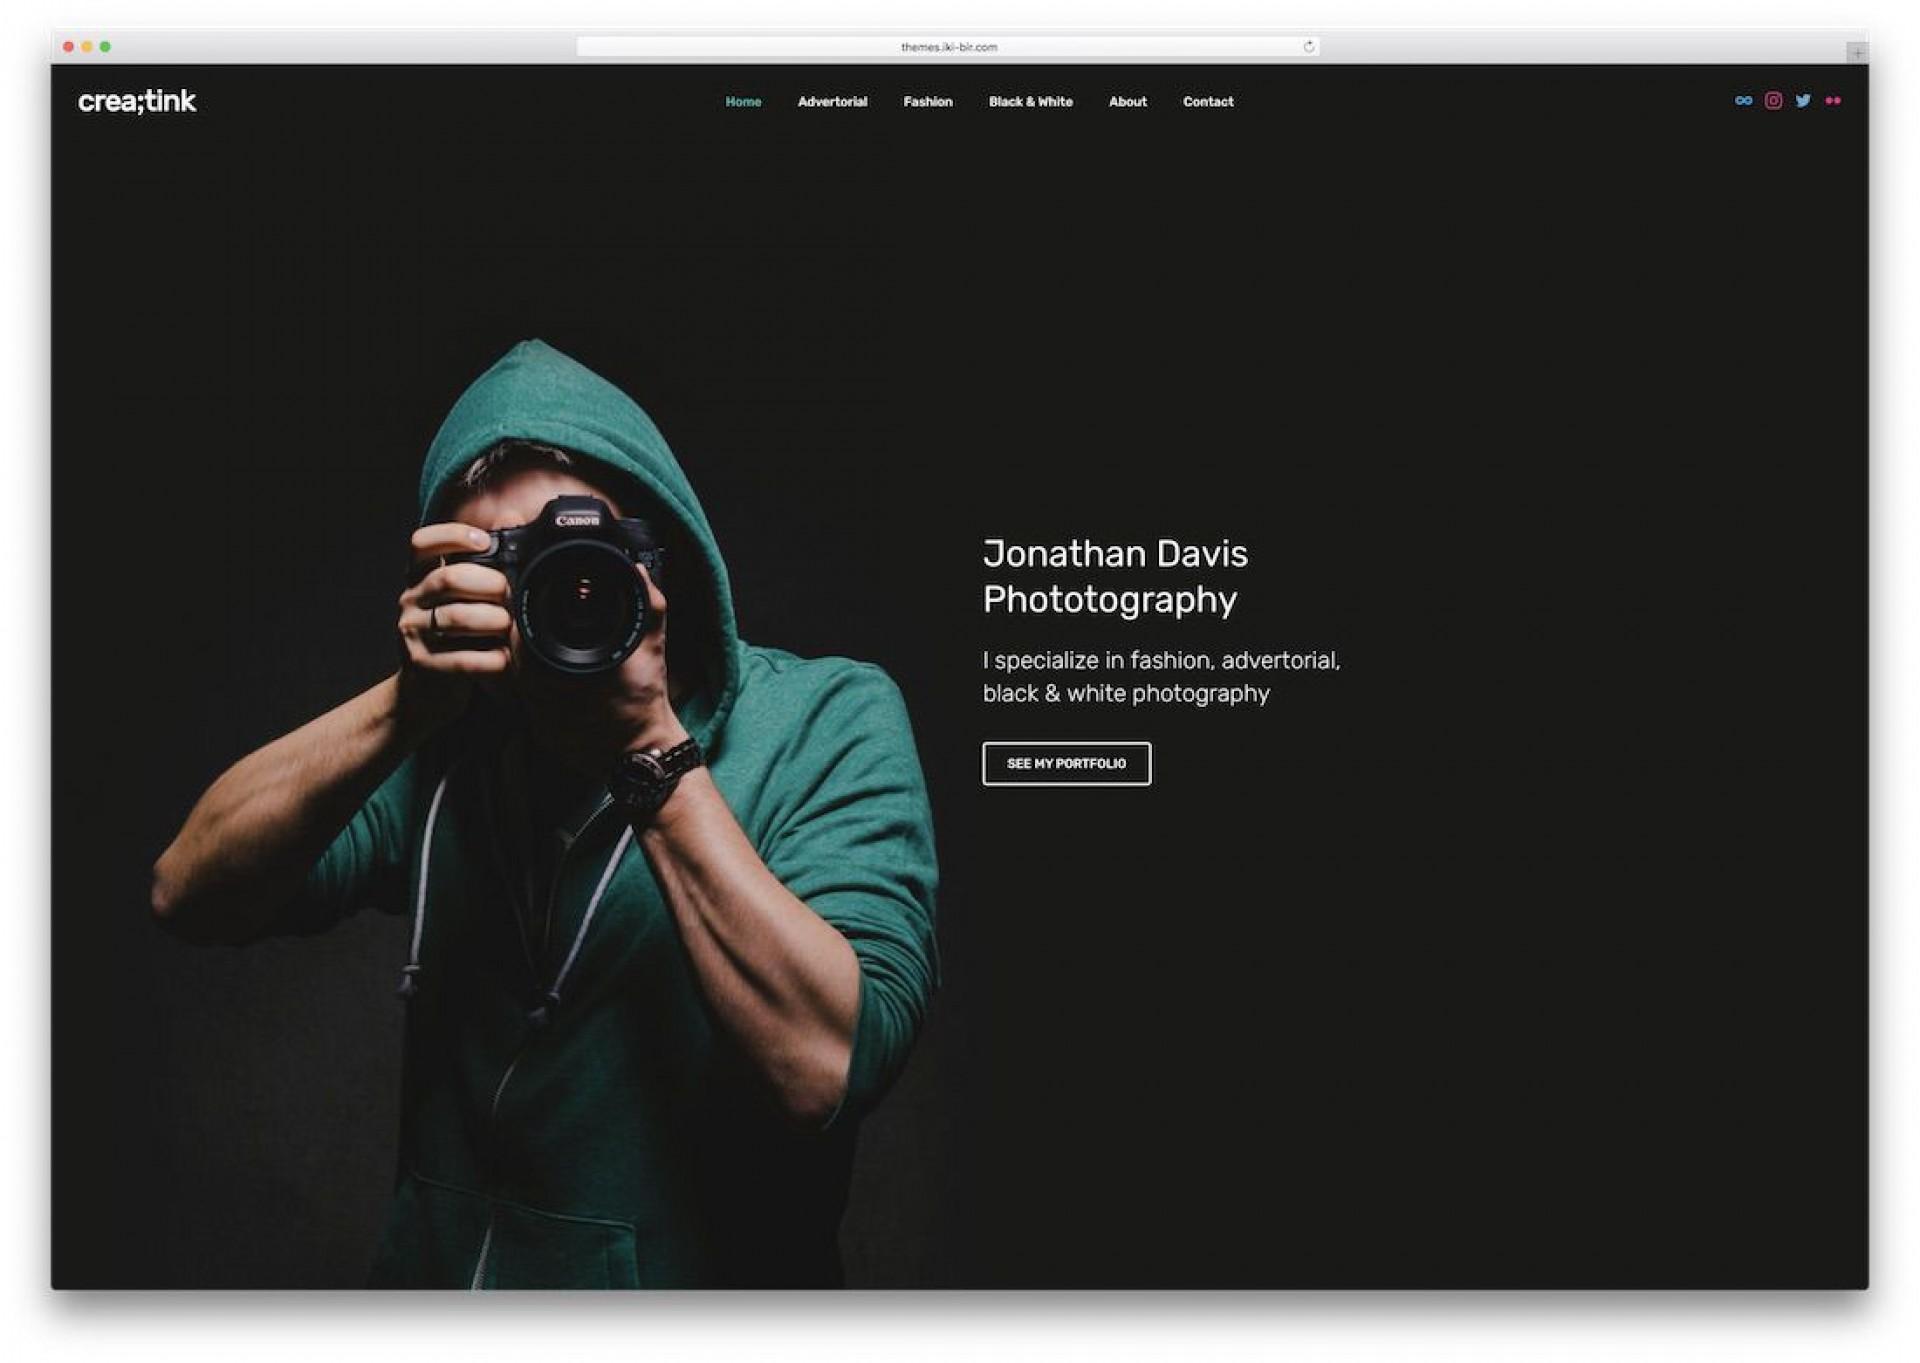 002 Beautiful Website Template For Photographer Image  Photographers Free Responsive Photography Php Best1920